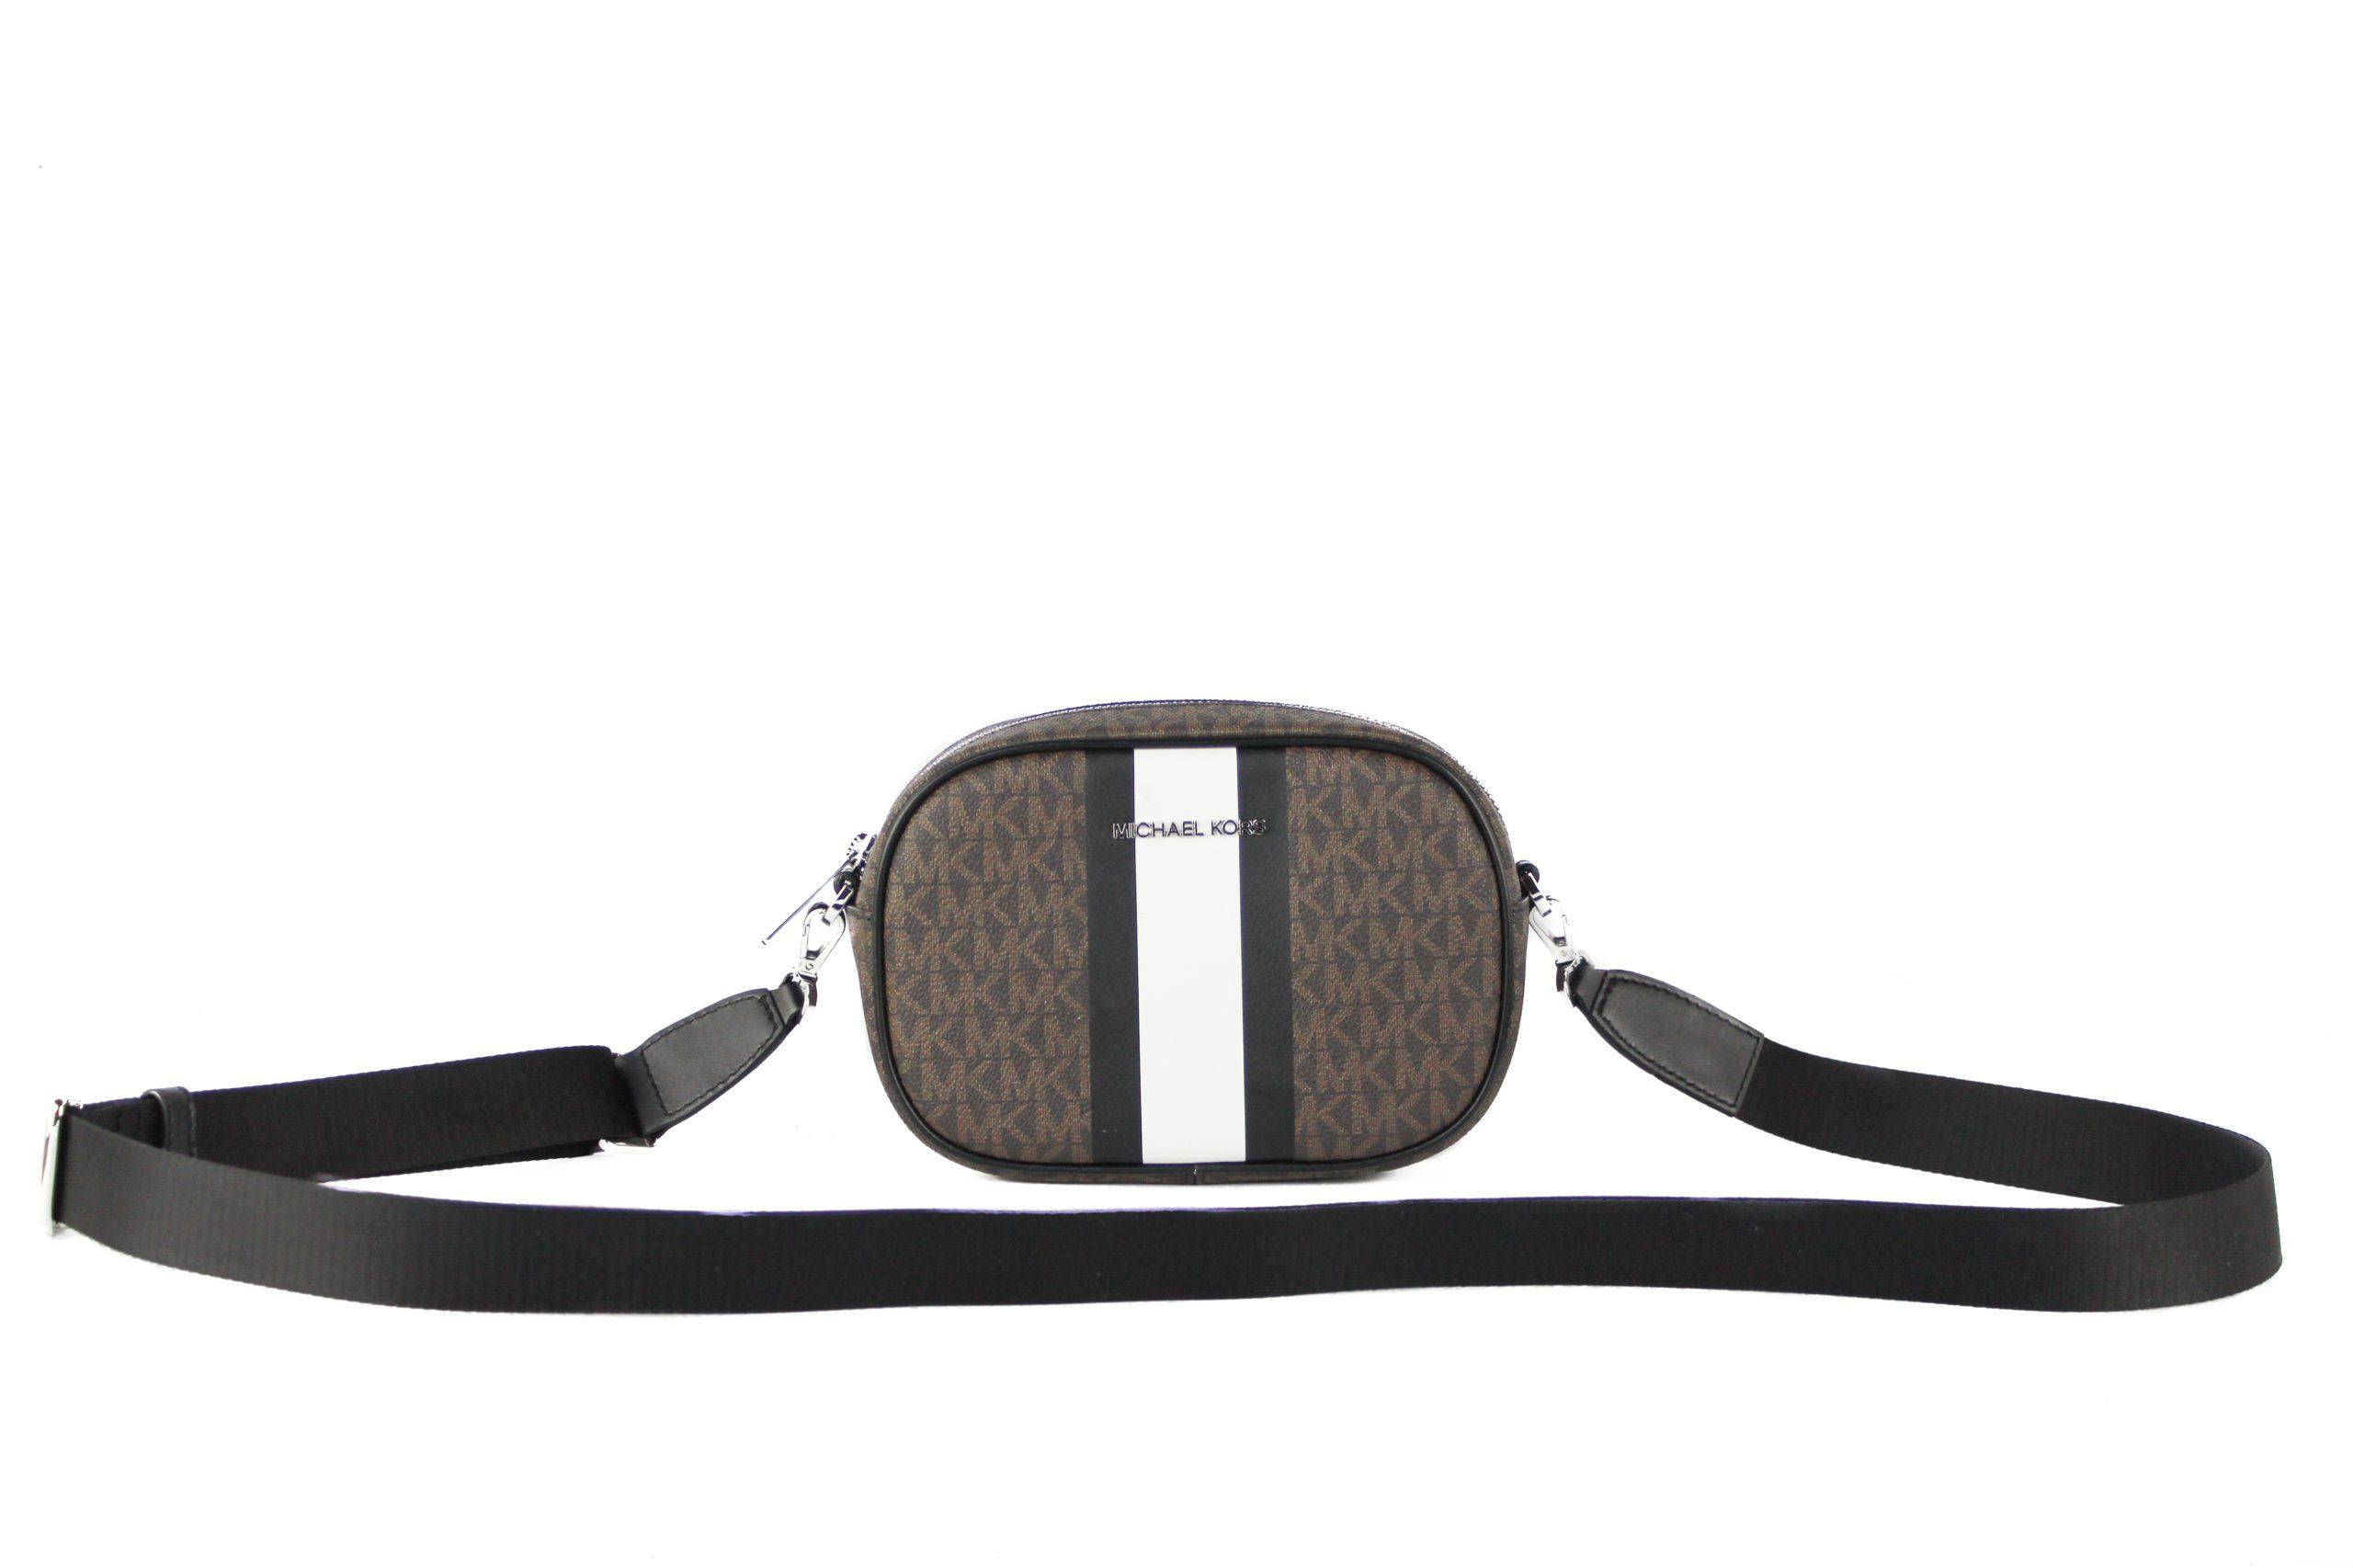 Michael Kors Women's Jet Set Crossbody Bag Brown 13088